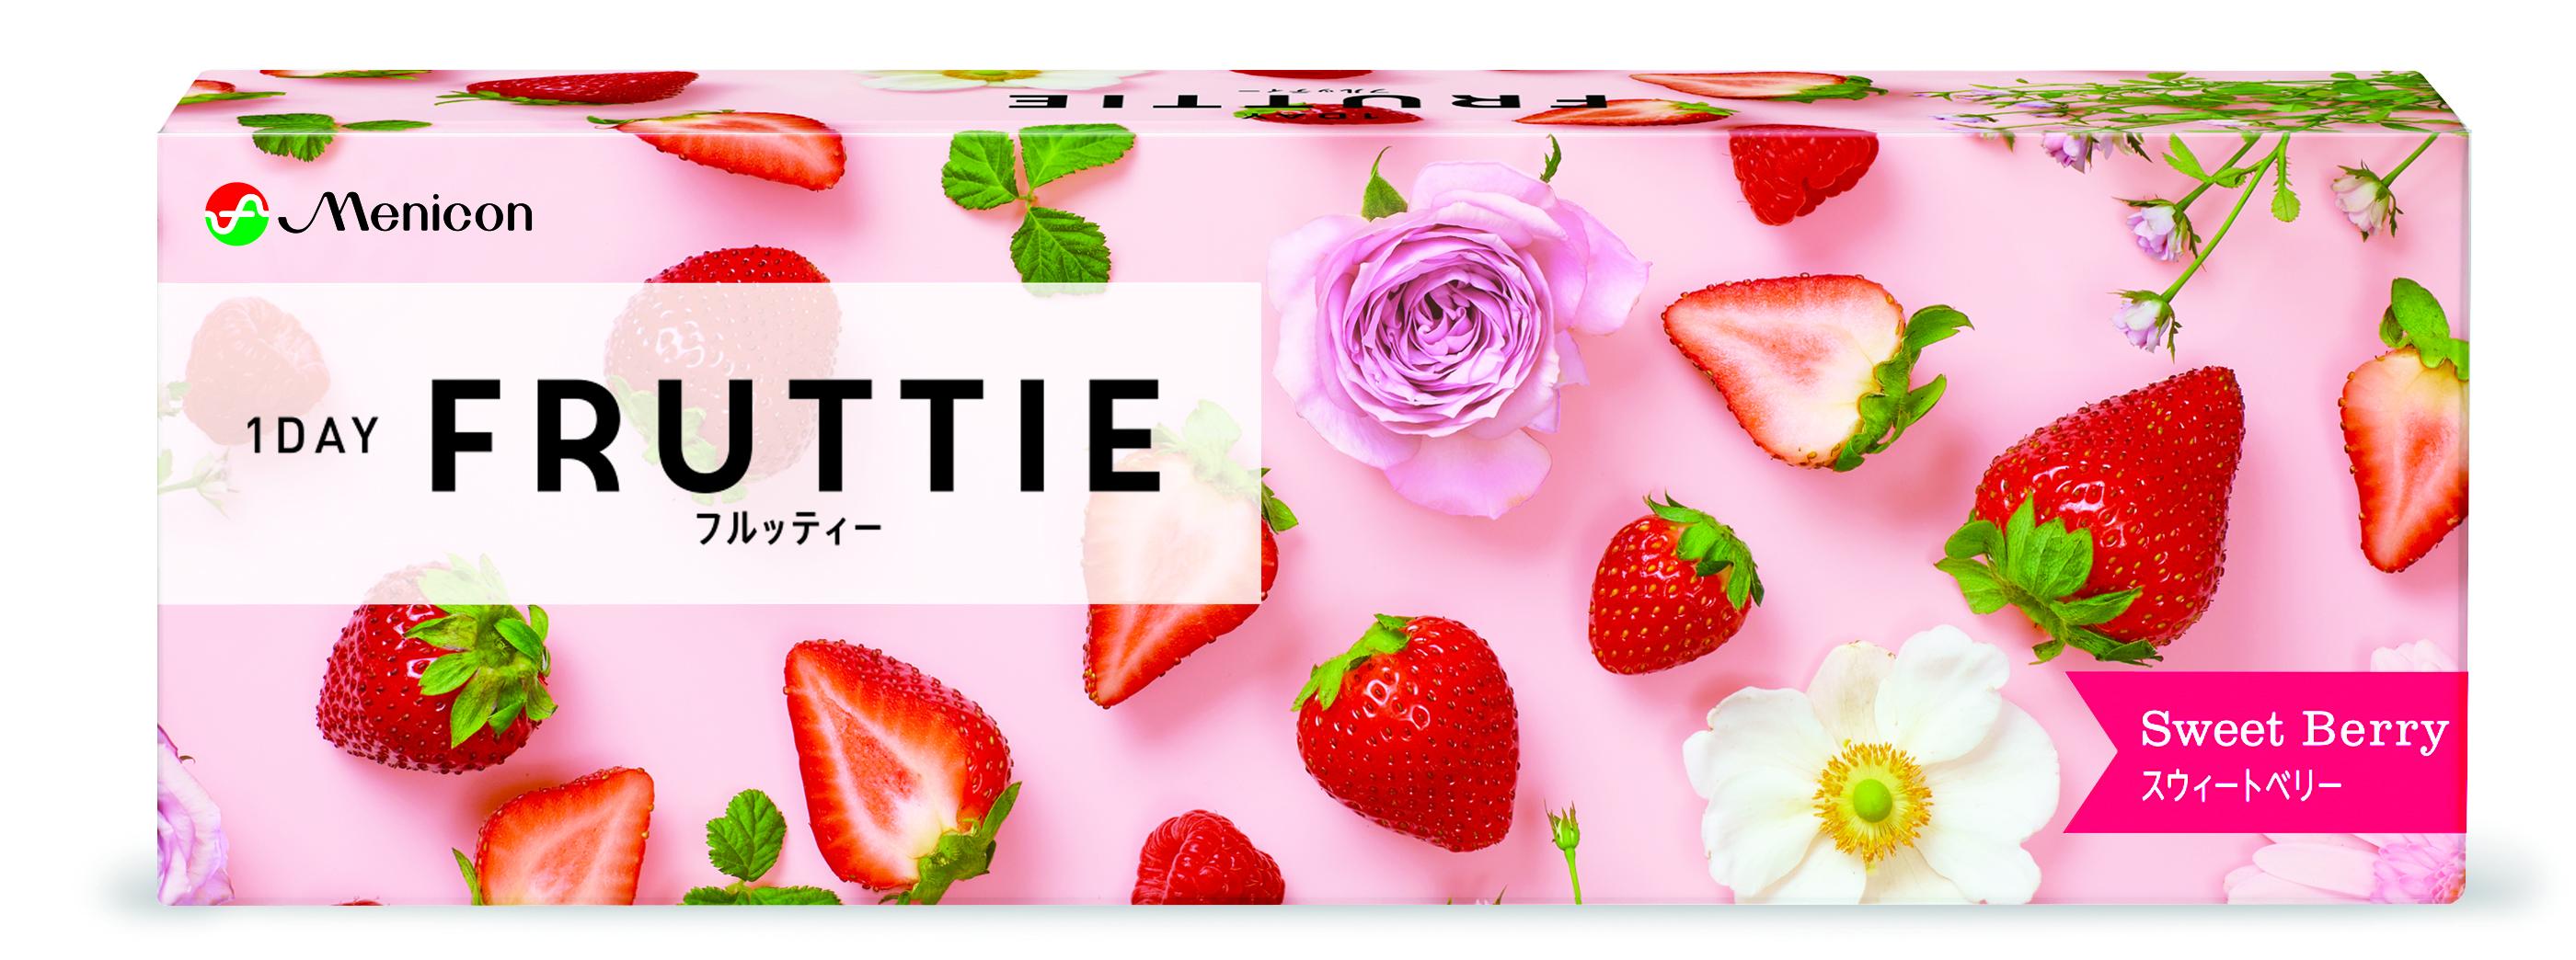 fruttie_front_スウィートベリー